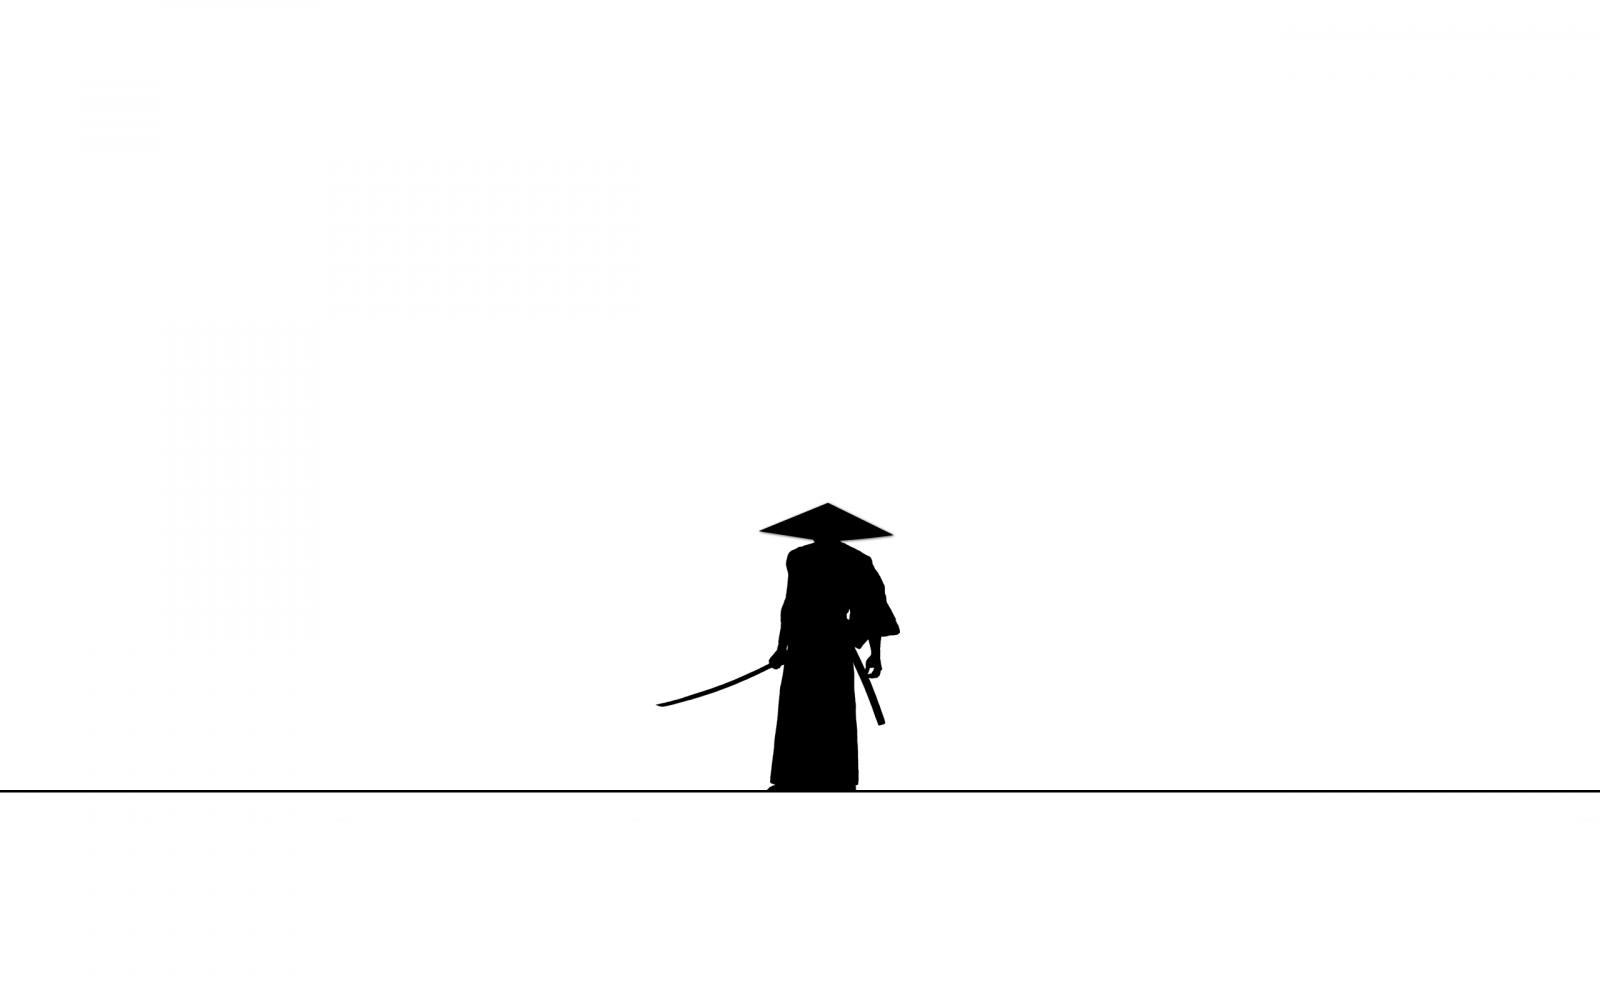 Wallpaper : samurai, minimalism, silhouette, simple ...